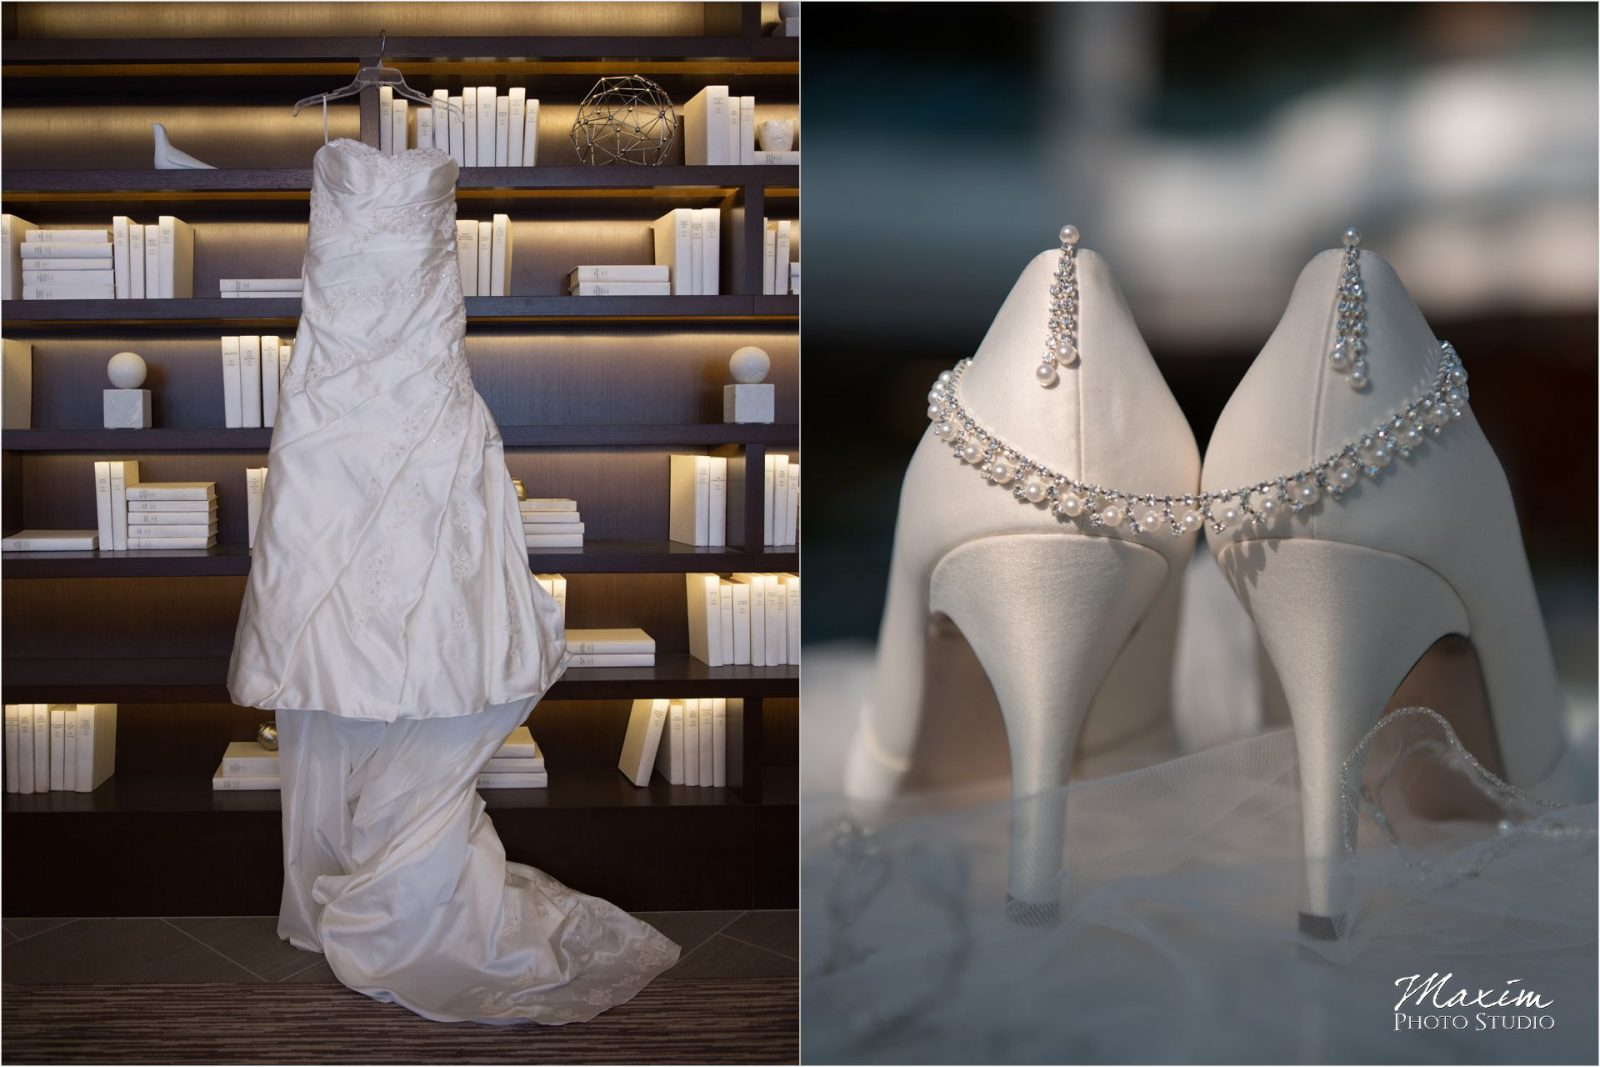 Hyatt Cincinnati Wedding Preparations